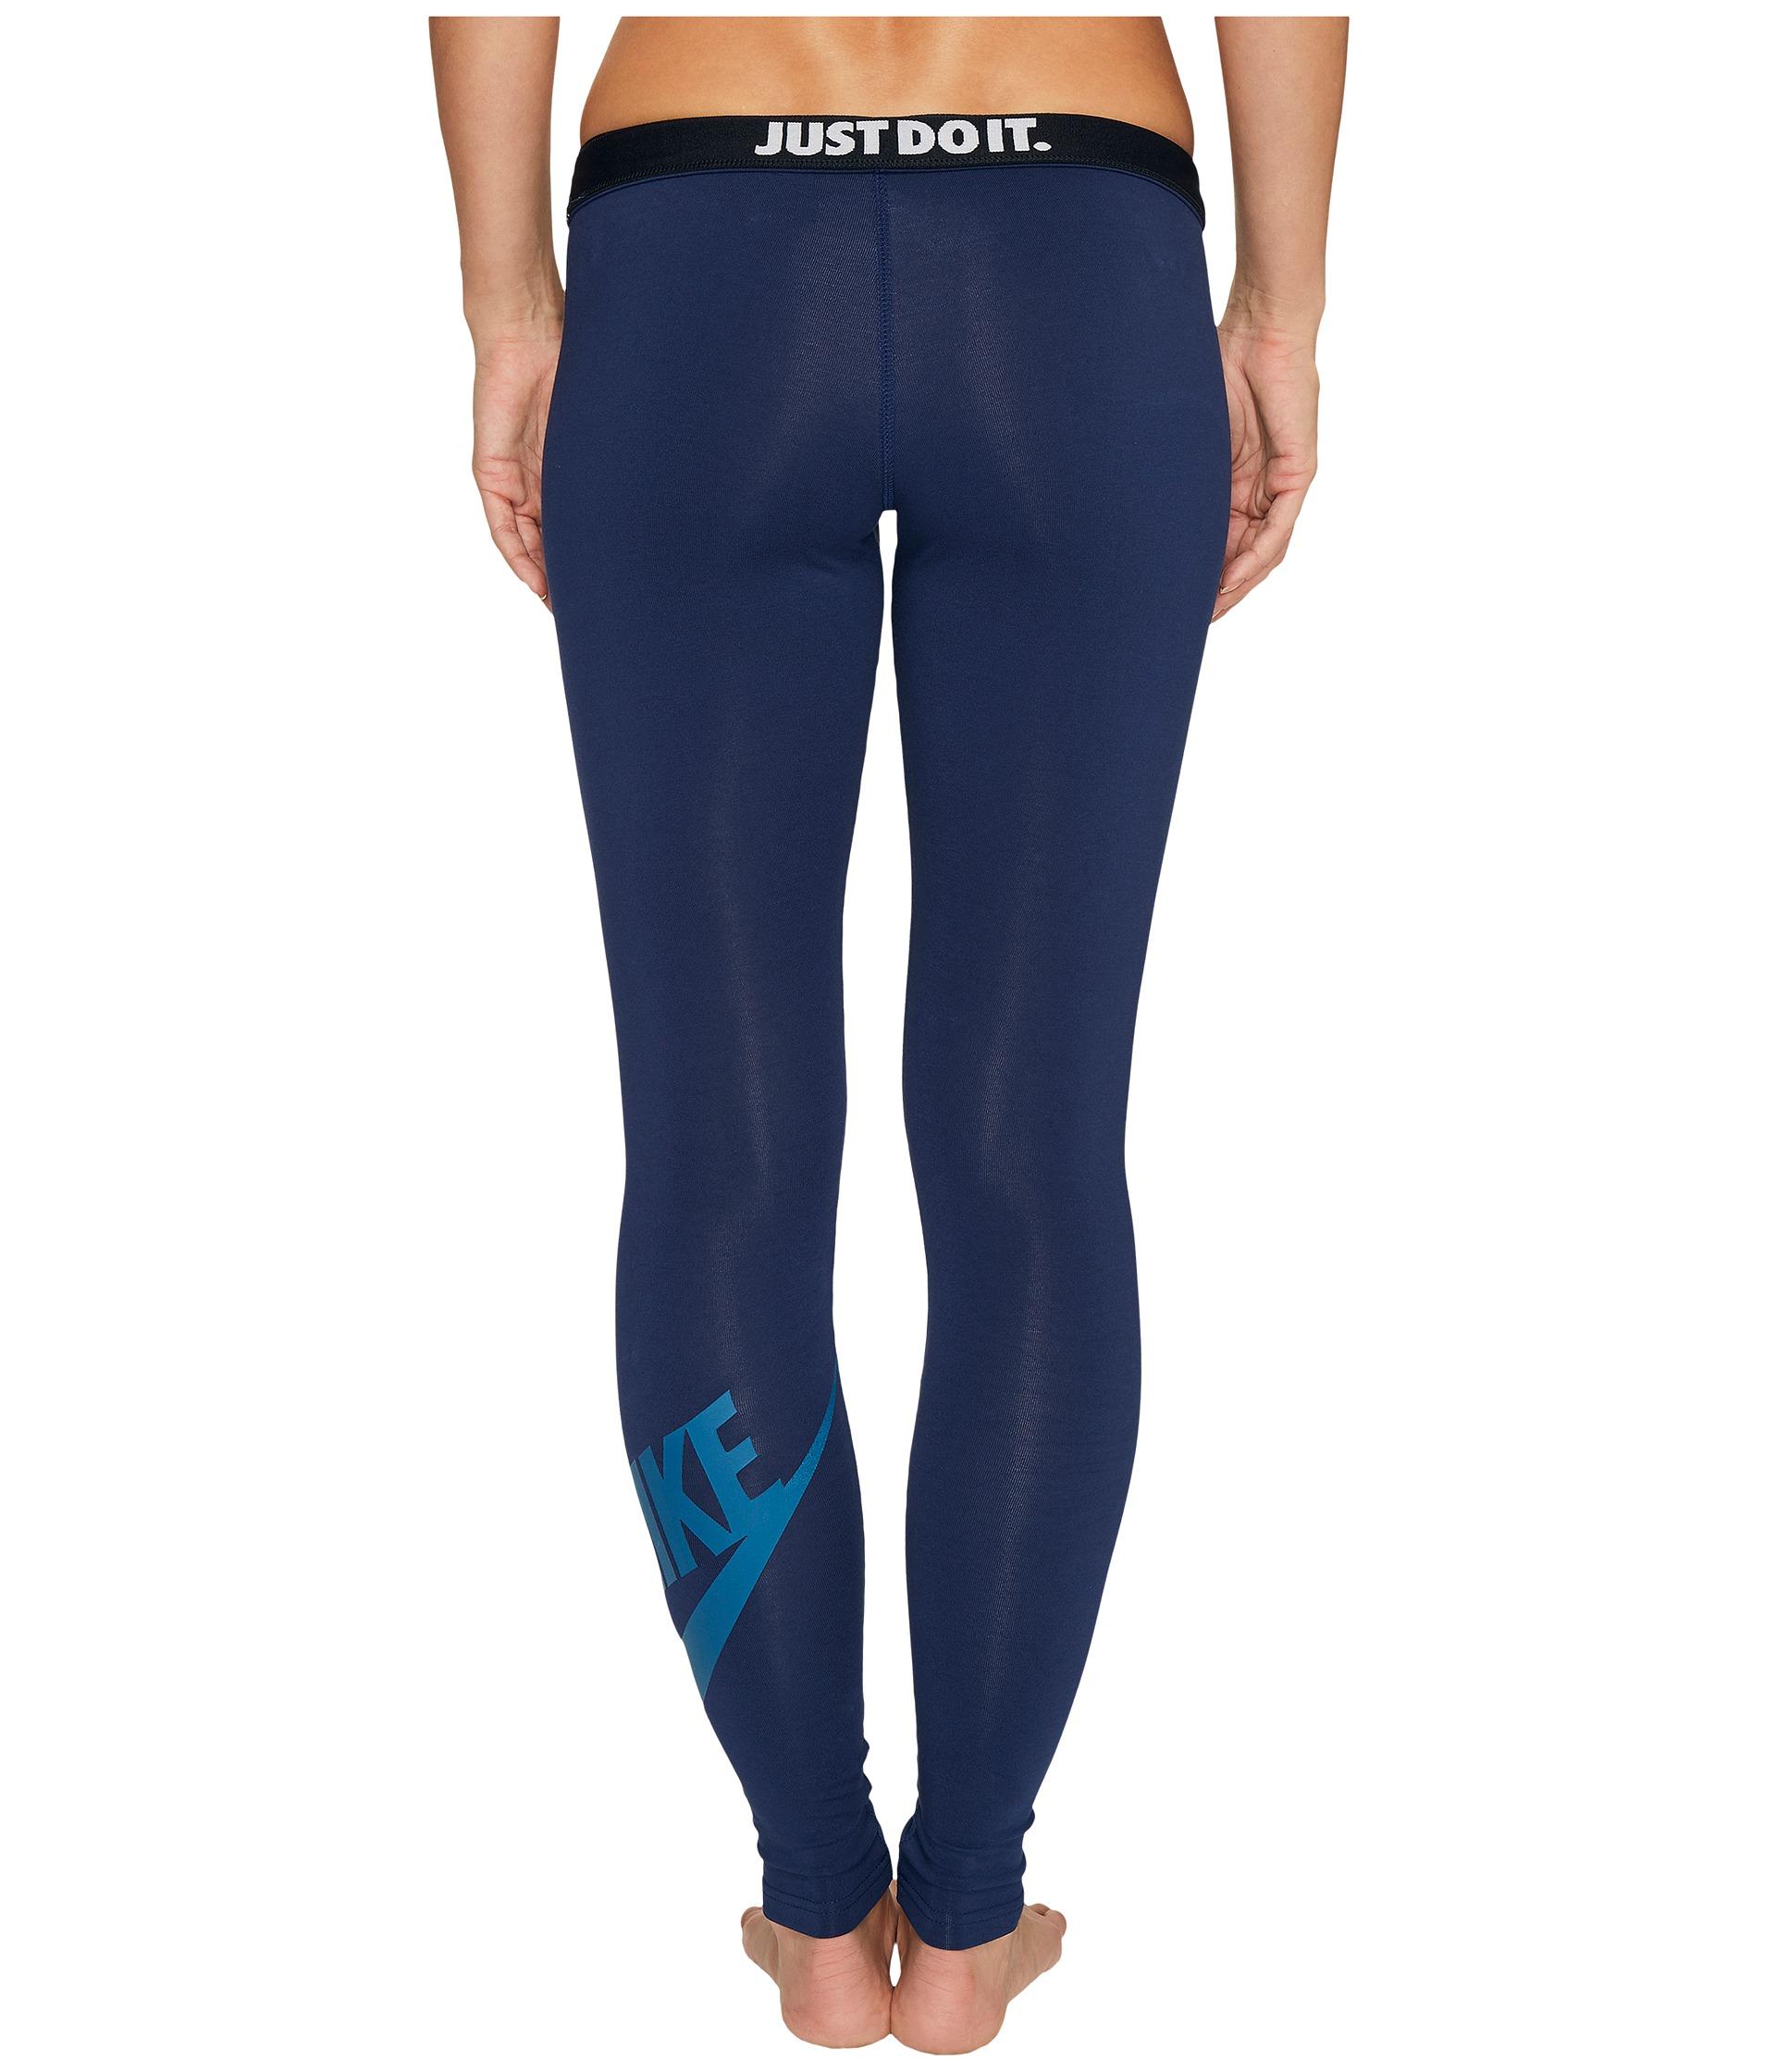 Nike Leg-A-See Logo Legging at Zappos.com